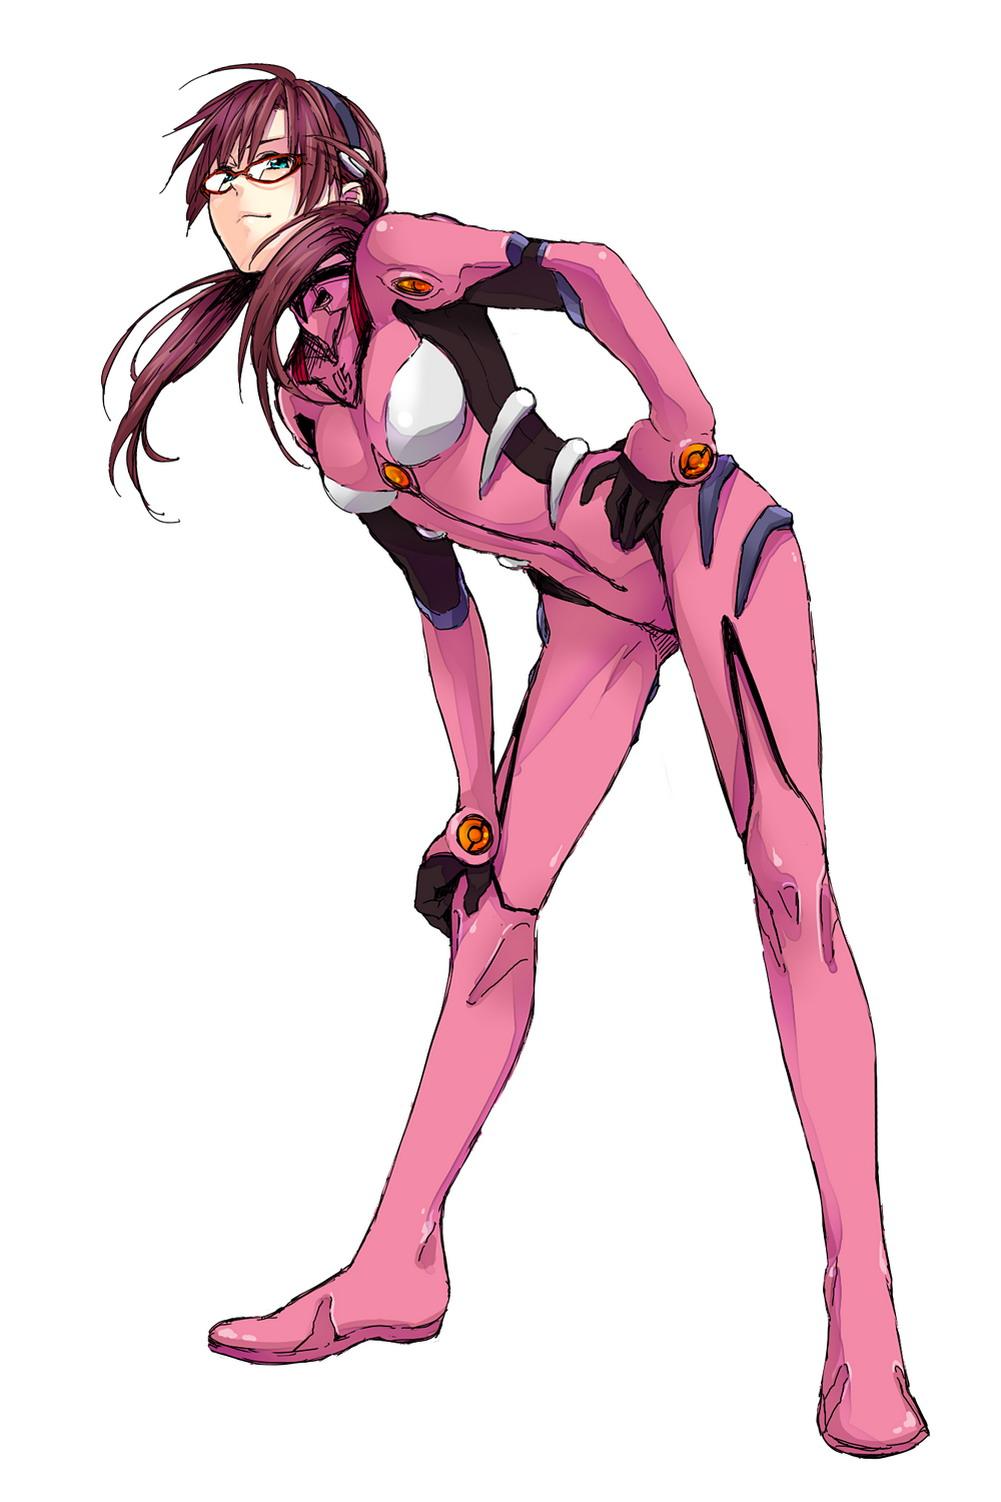 25+ Mari Illustrious Makinami Edad JPG